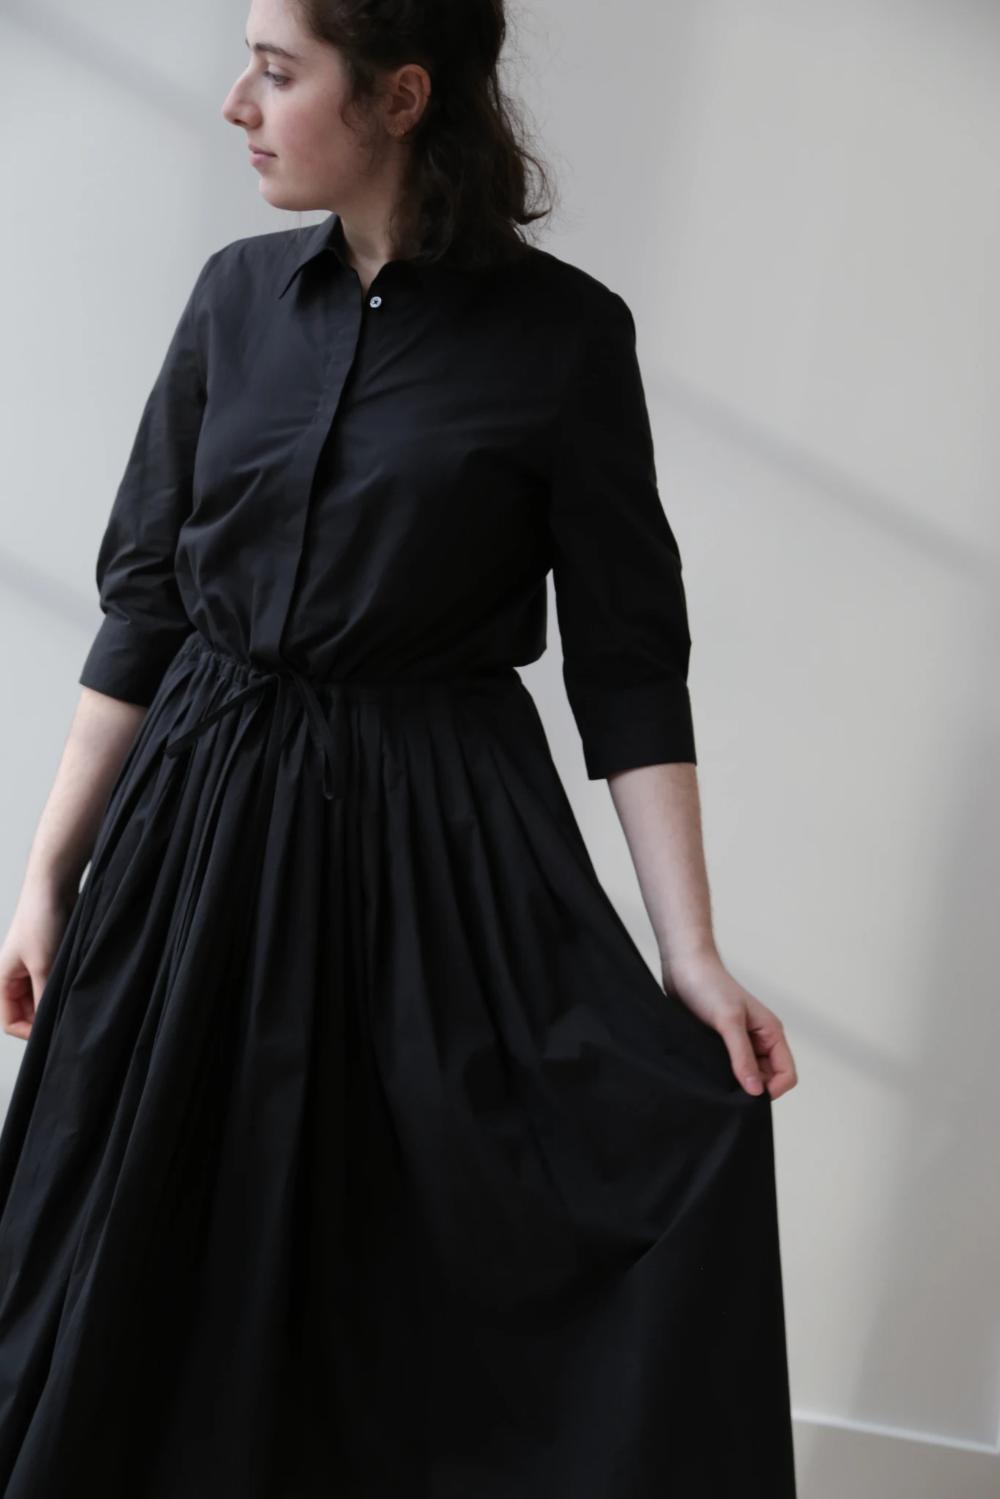 Rennes Sara Lanzi Chemisier Dress In Black Dresses Fashion Victorian Dress [ 1499 x 1000 Pixel ]